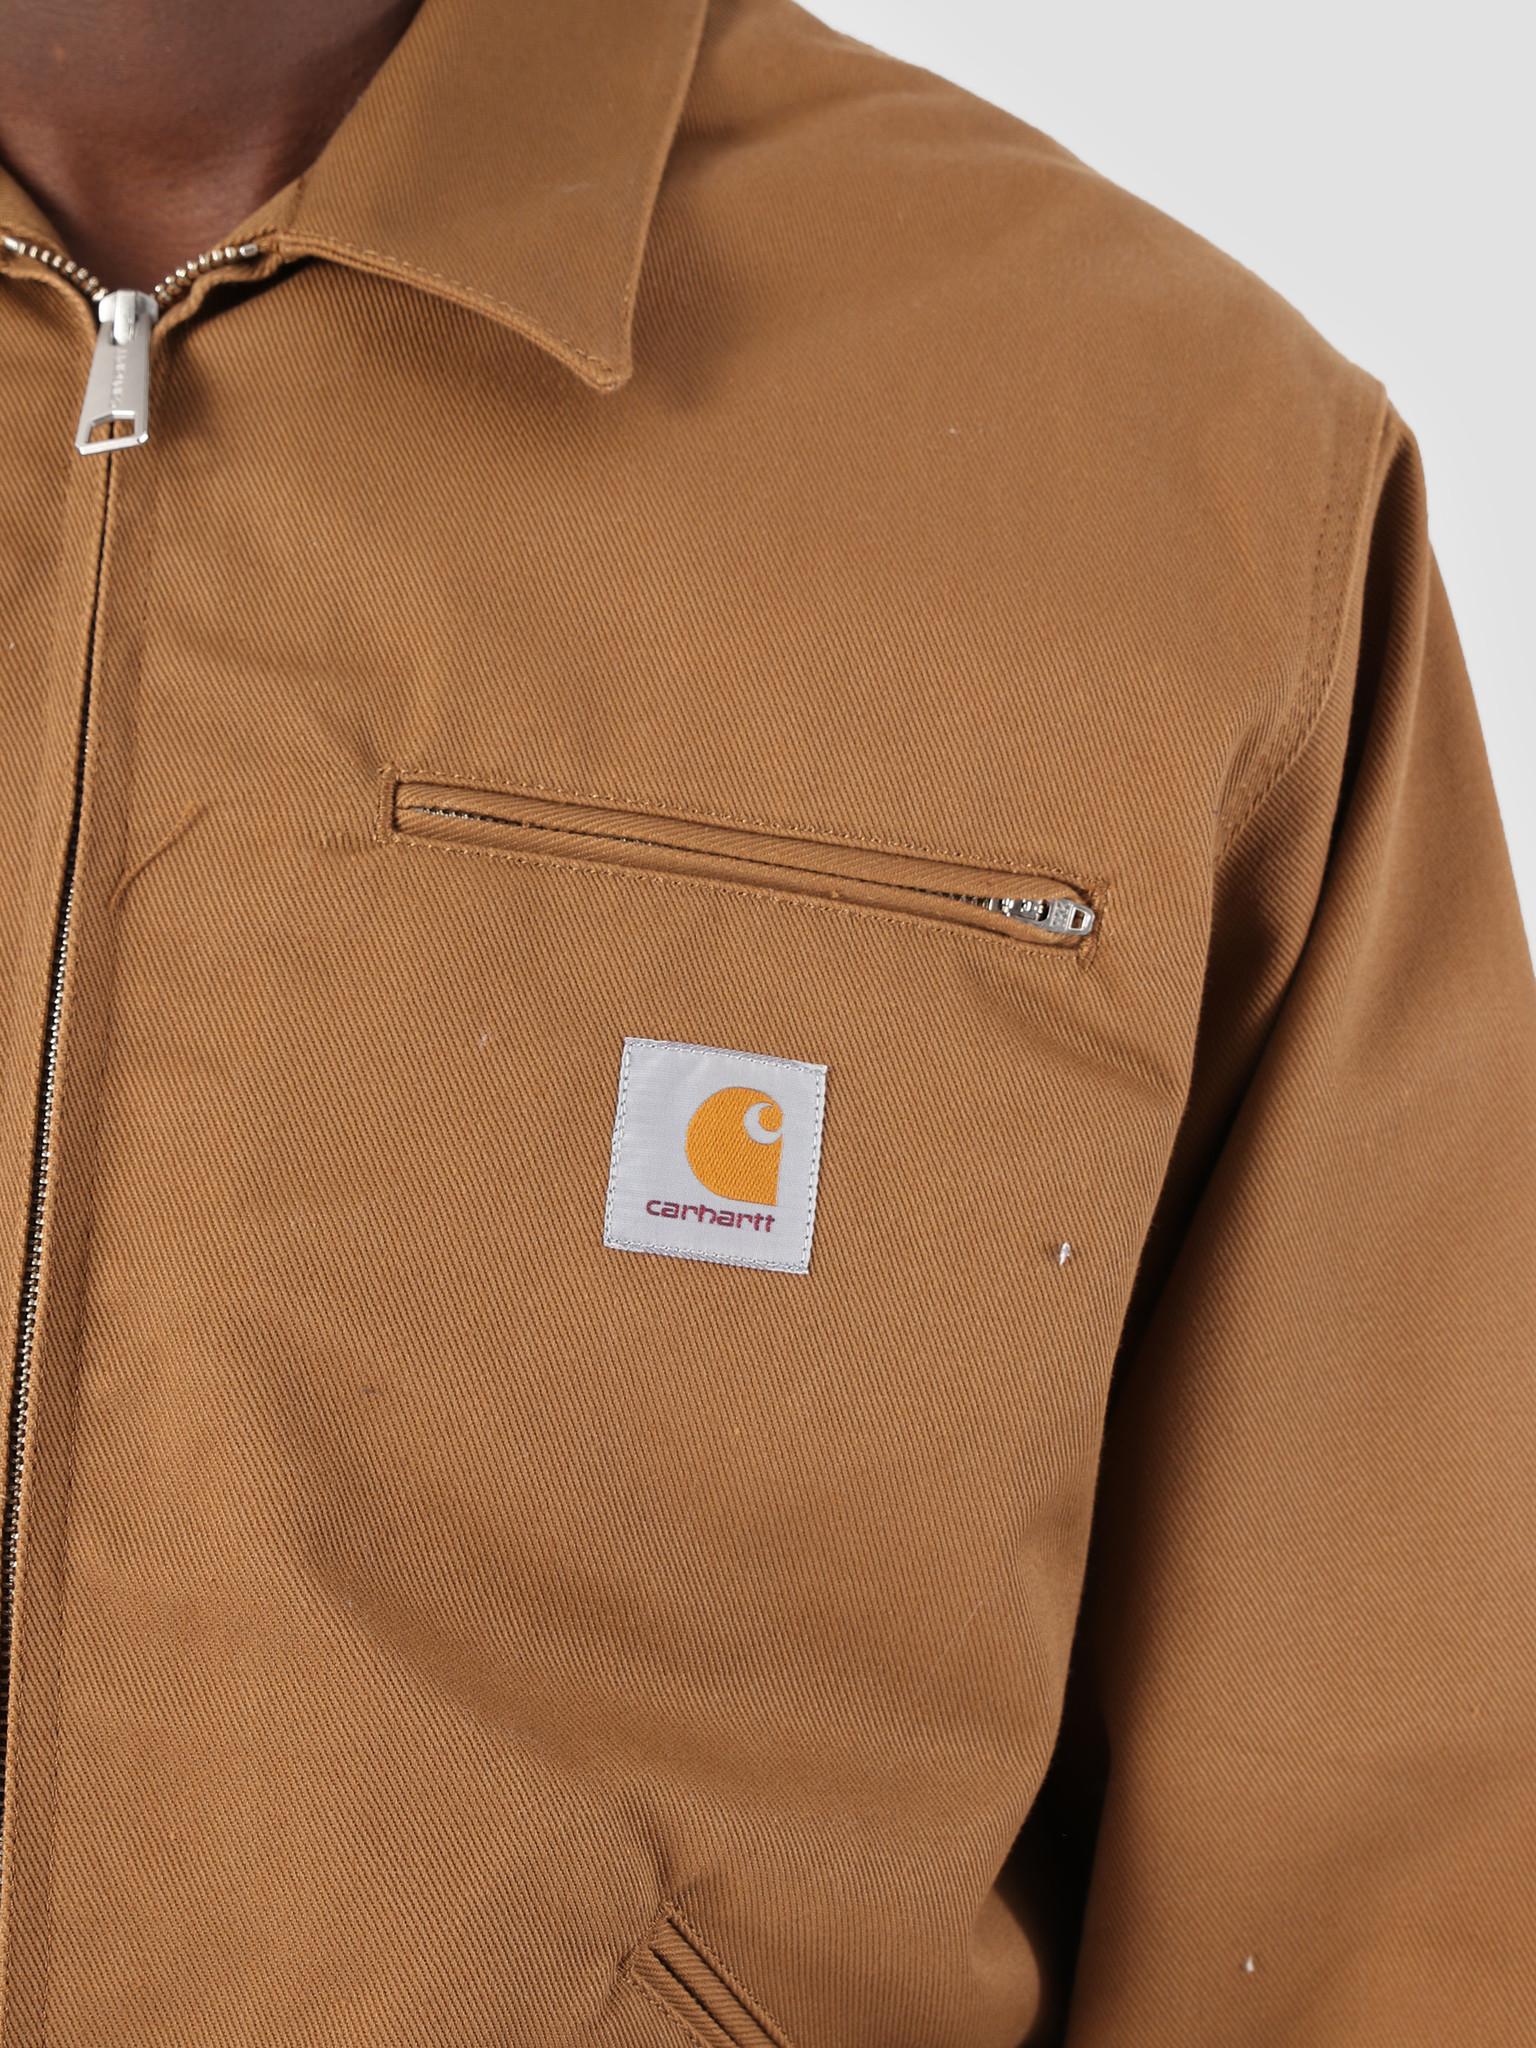 Carhartt WIP Carhartt WIP Og Detroit Jacket Rigid Hamilton Brown I026465